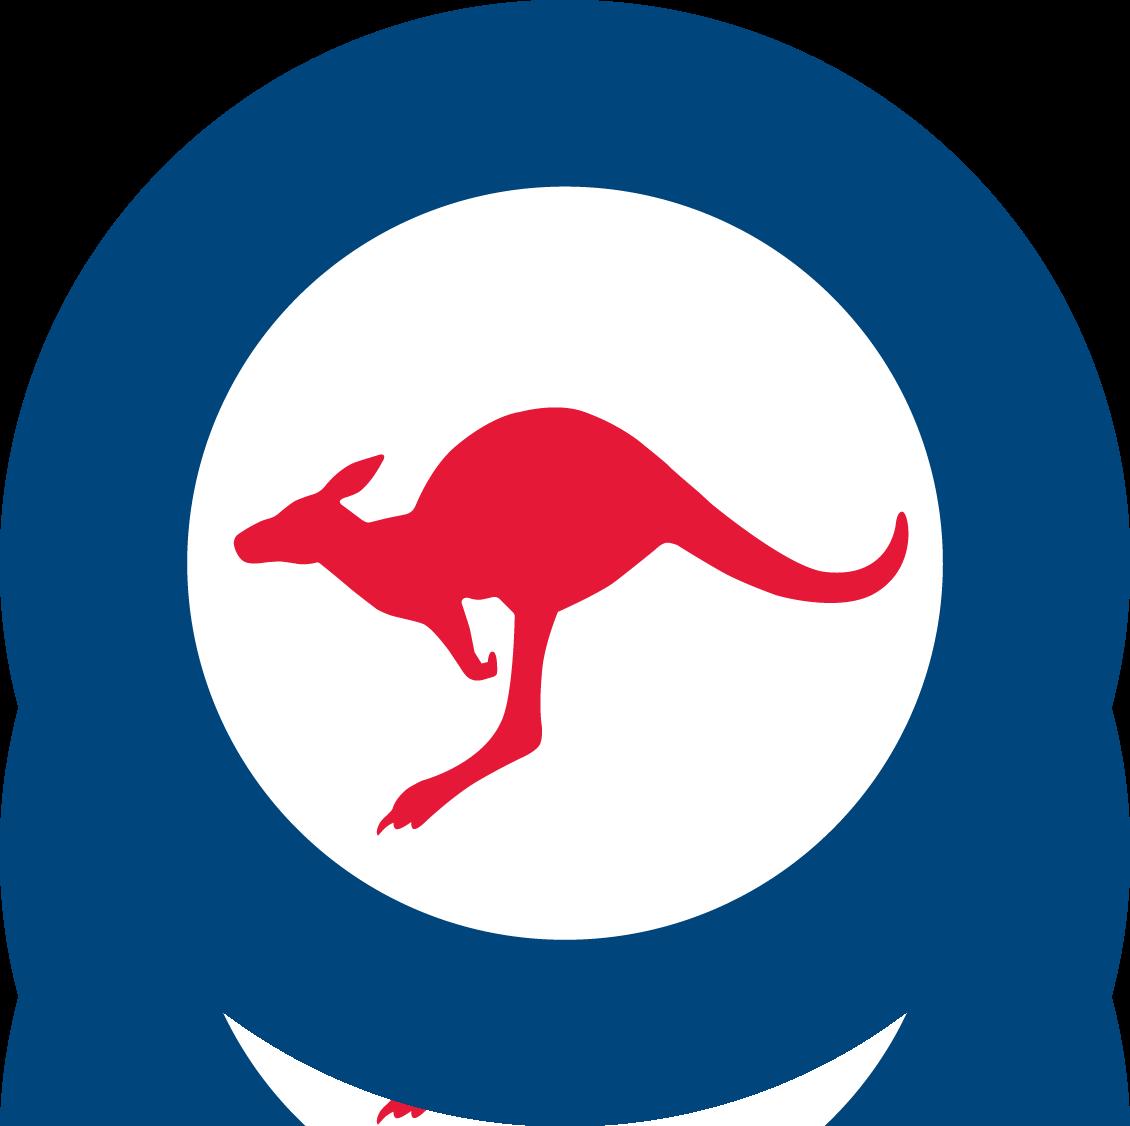 Kangaroo clipart aboriginal kangaroo. Raaf aus airforce on